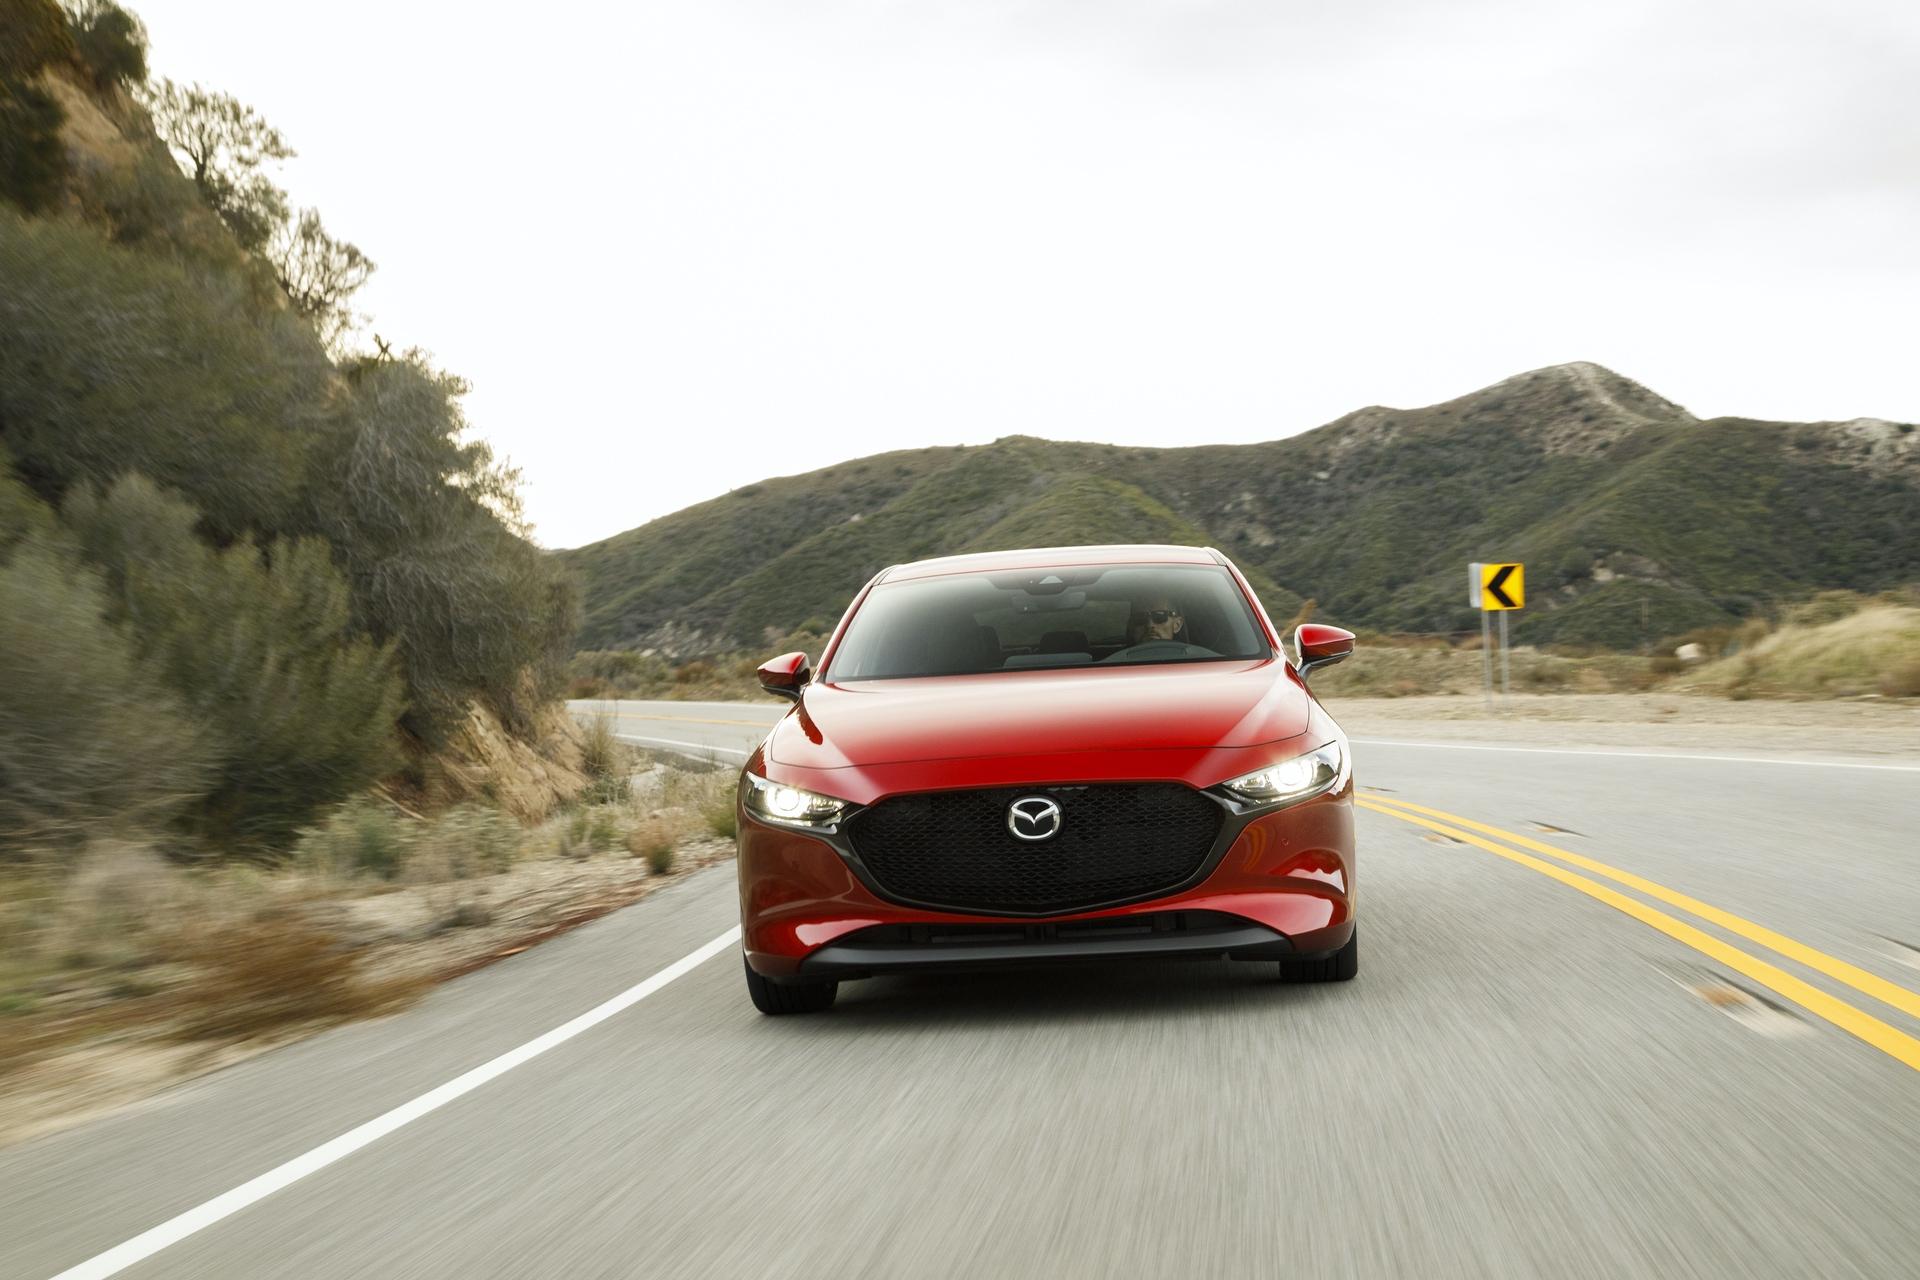 2019-Mazda3-Hatchback_10